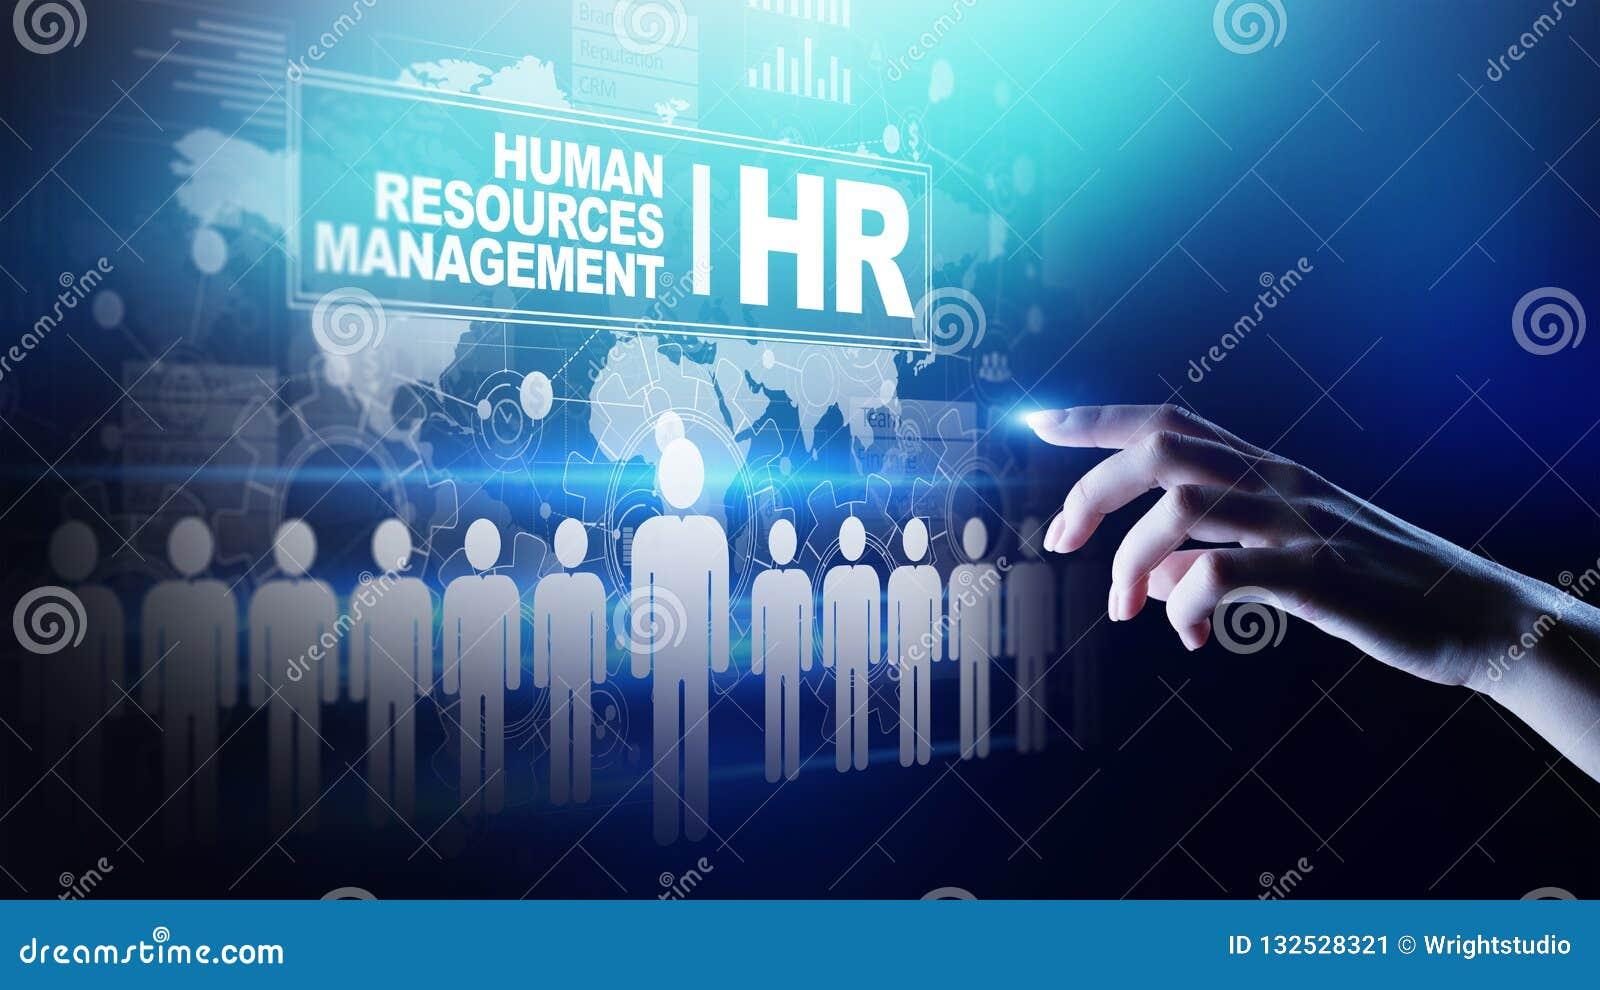 Personal, Stunden-Management, Einstellung, Talent gewünscht, Beschäftigungs-Geschäfts-Konzept